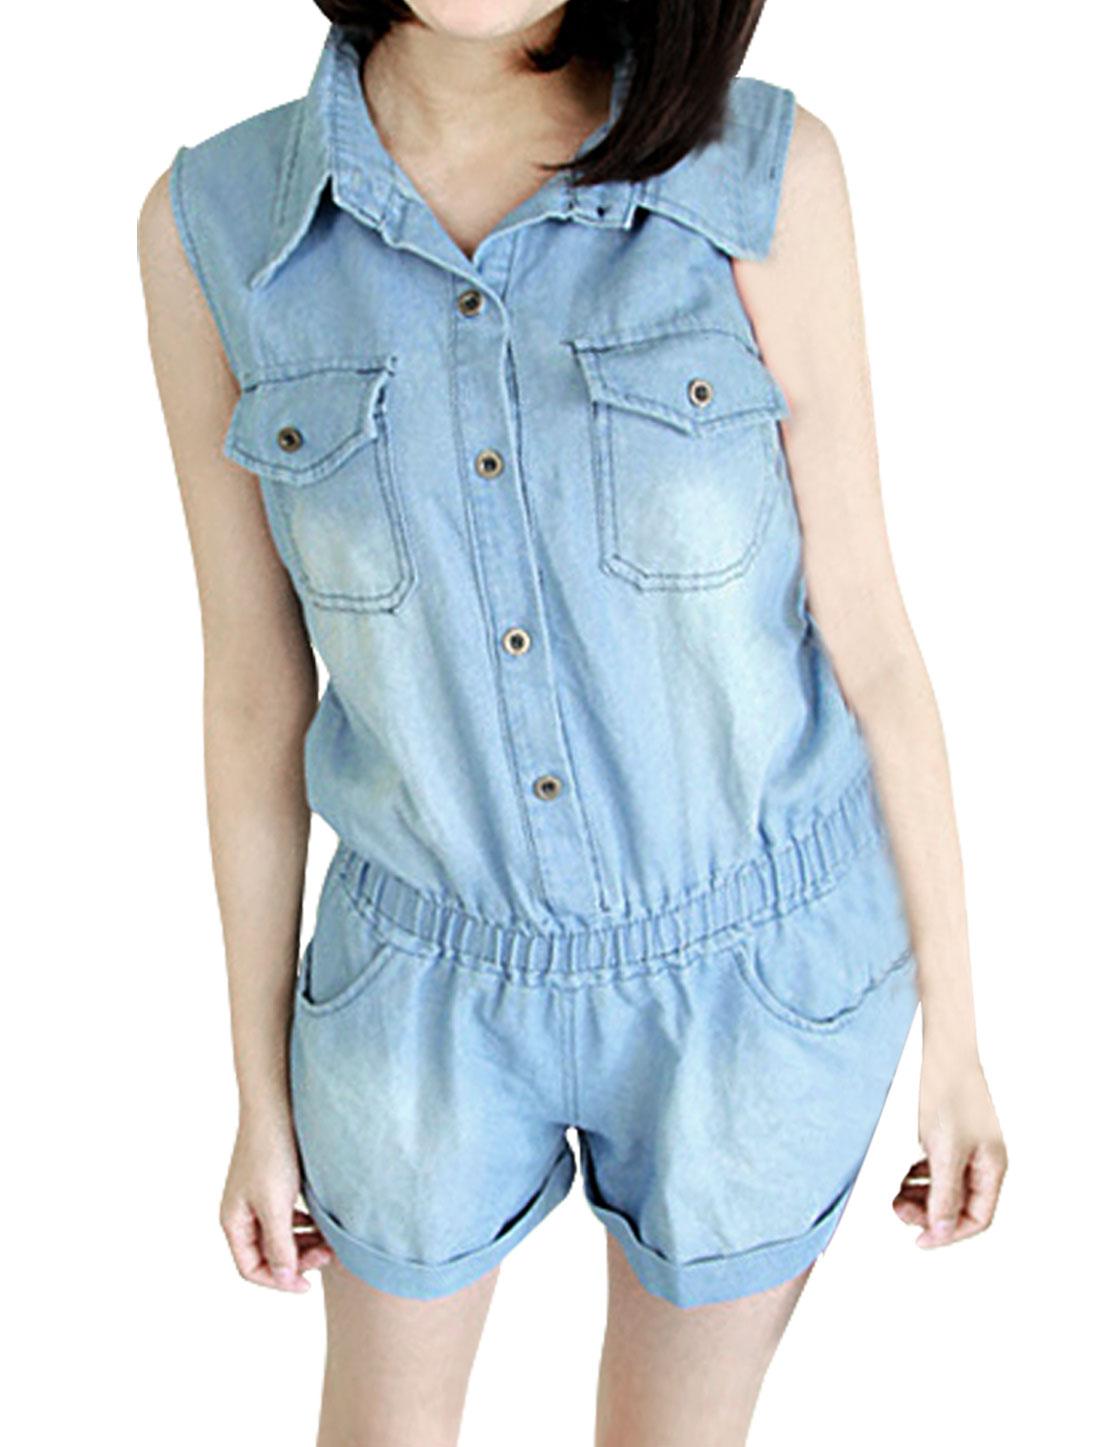 Women Chest Pockets Point Collar Elastic Waist Romper S Light Blue